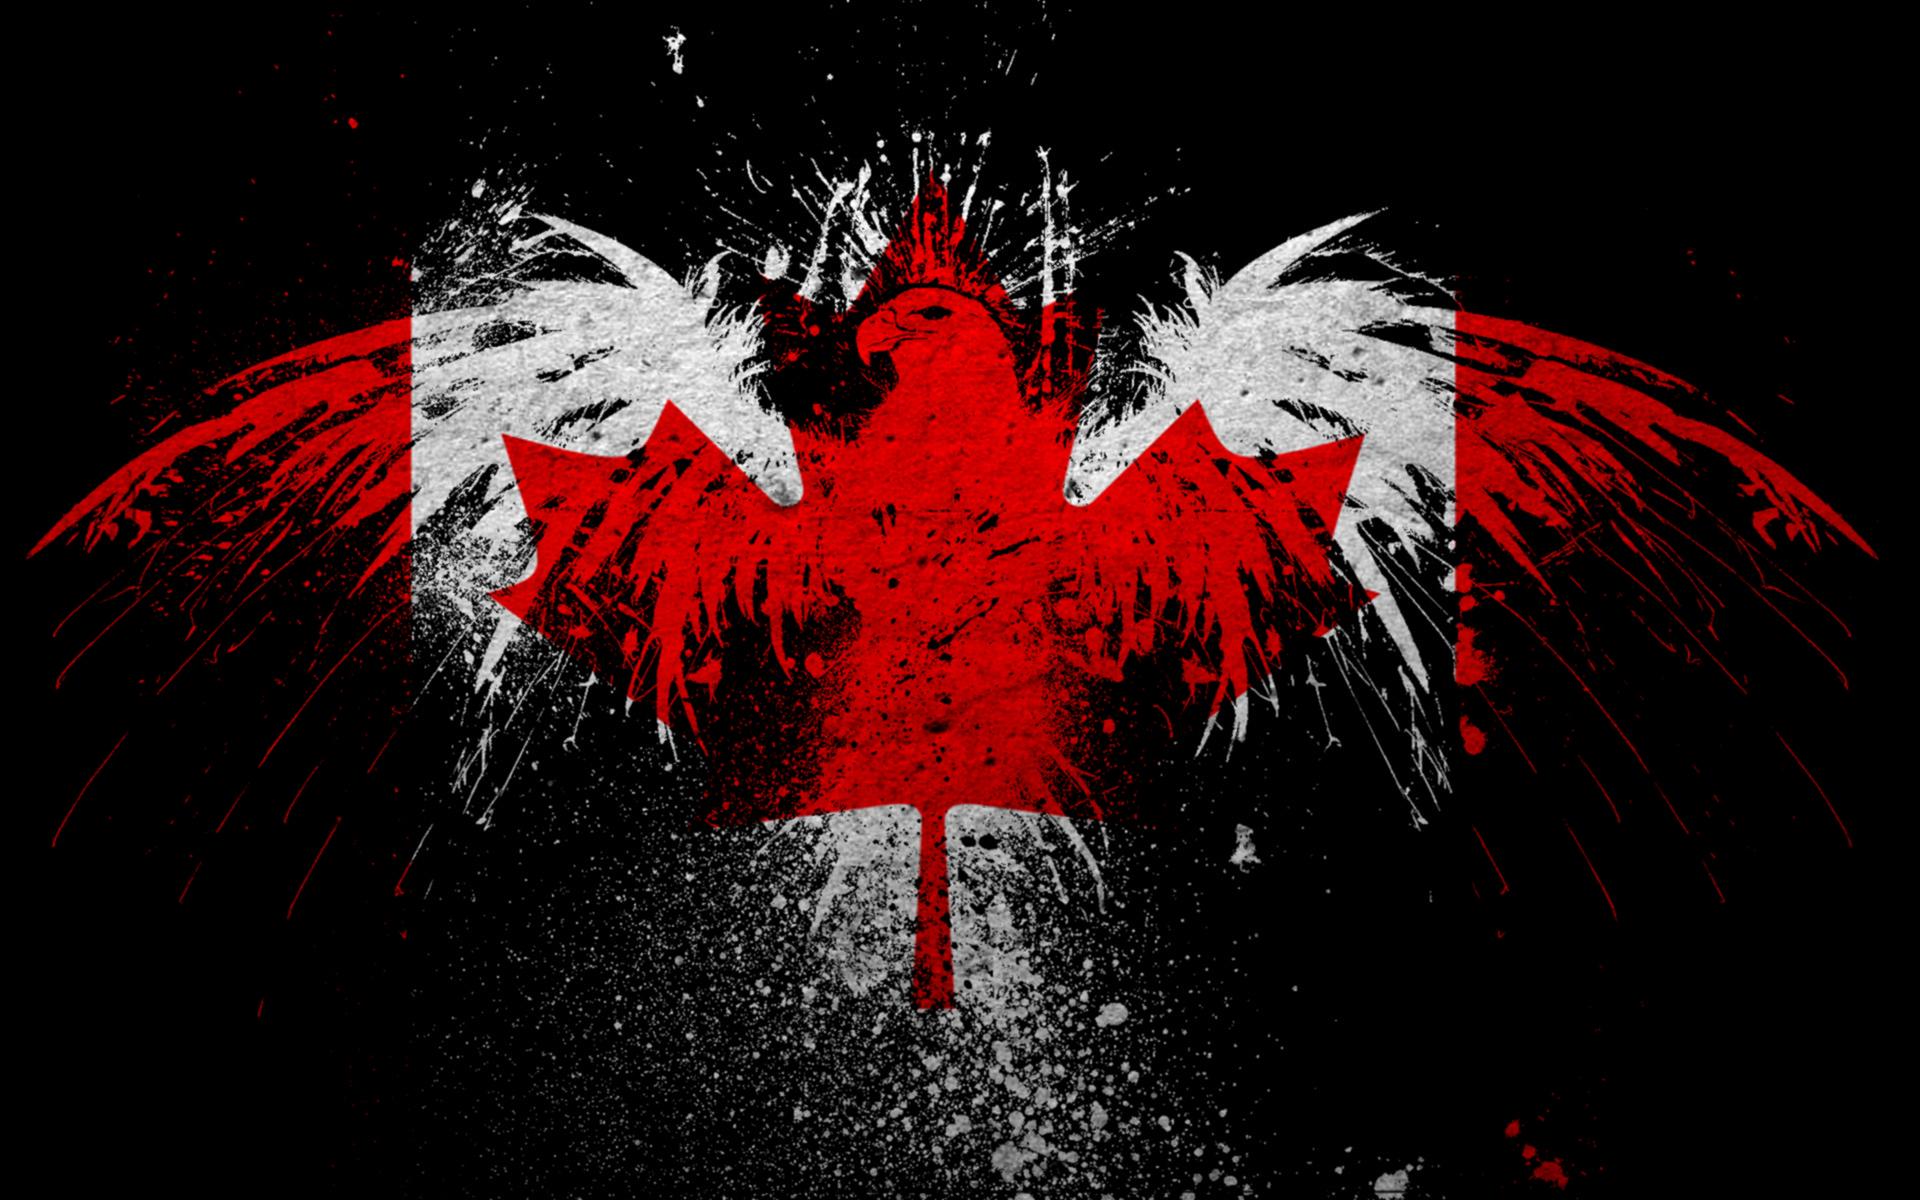 Desktop Wallpaper 3d French Country Canada Flag Wallpapers Hd Pixelstalk Net